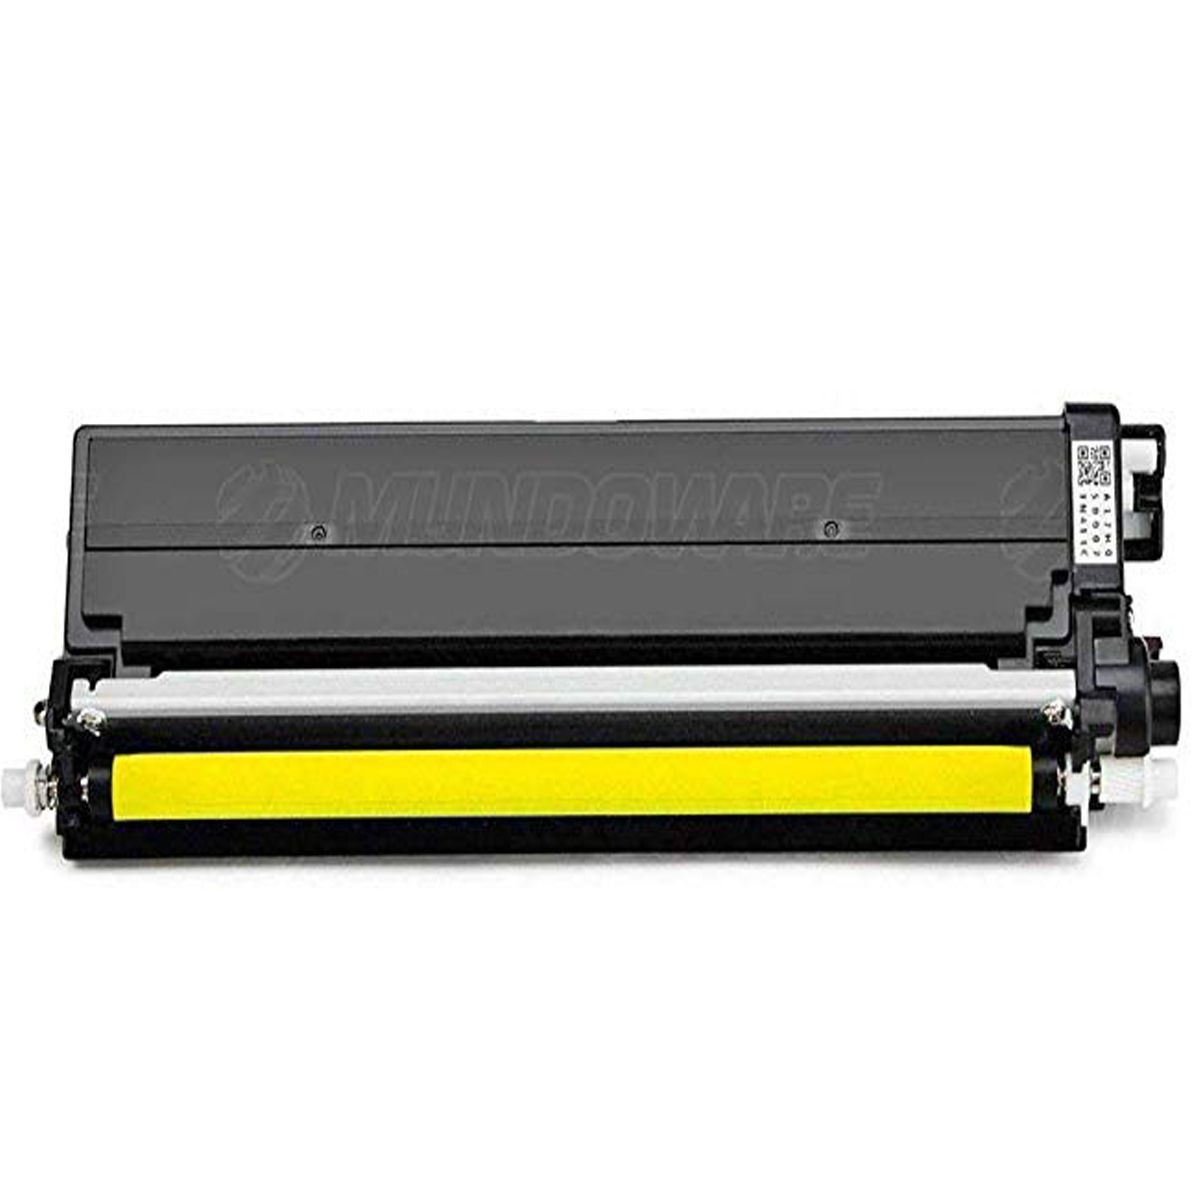 Toner Brother TN419 TN411 TN413 TN421 TN431 TN441 TN451 TN461 TN491 - Amarelo - Compativel